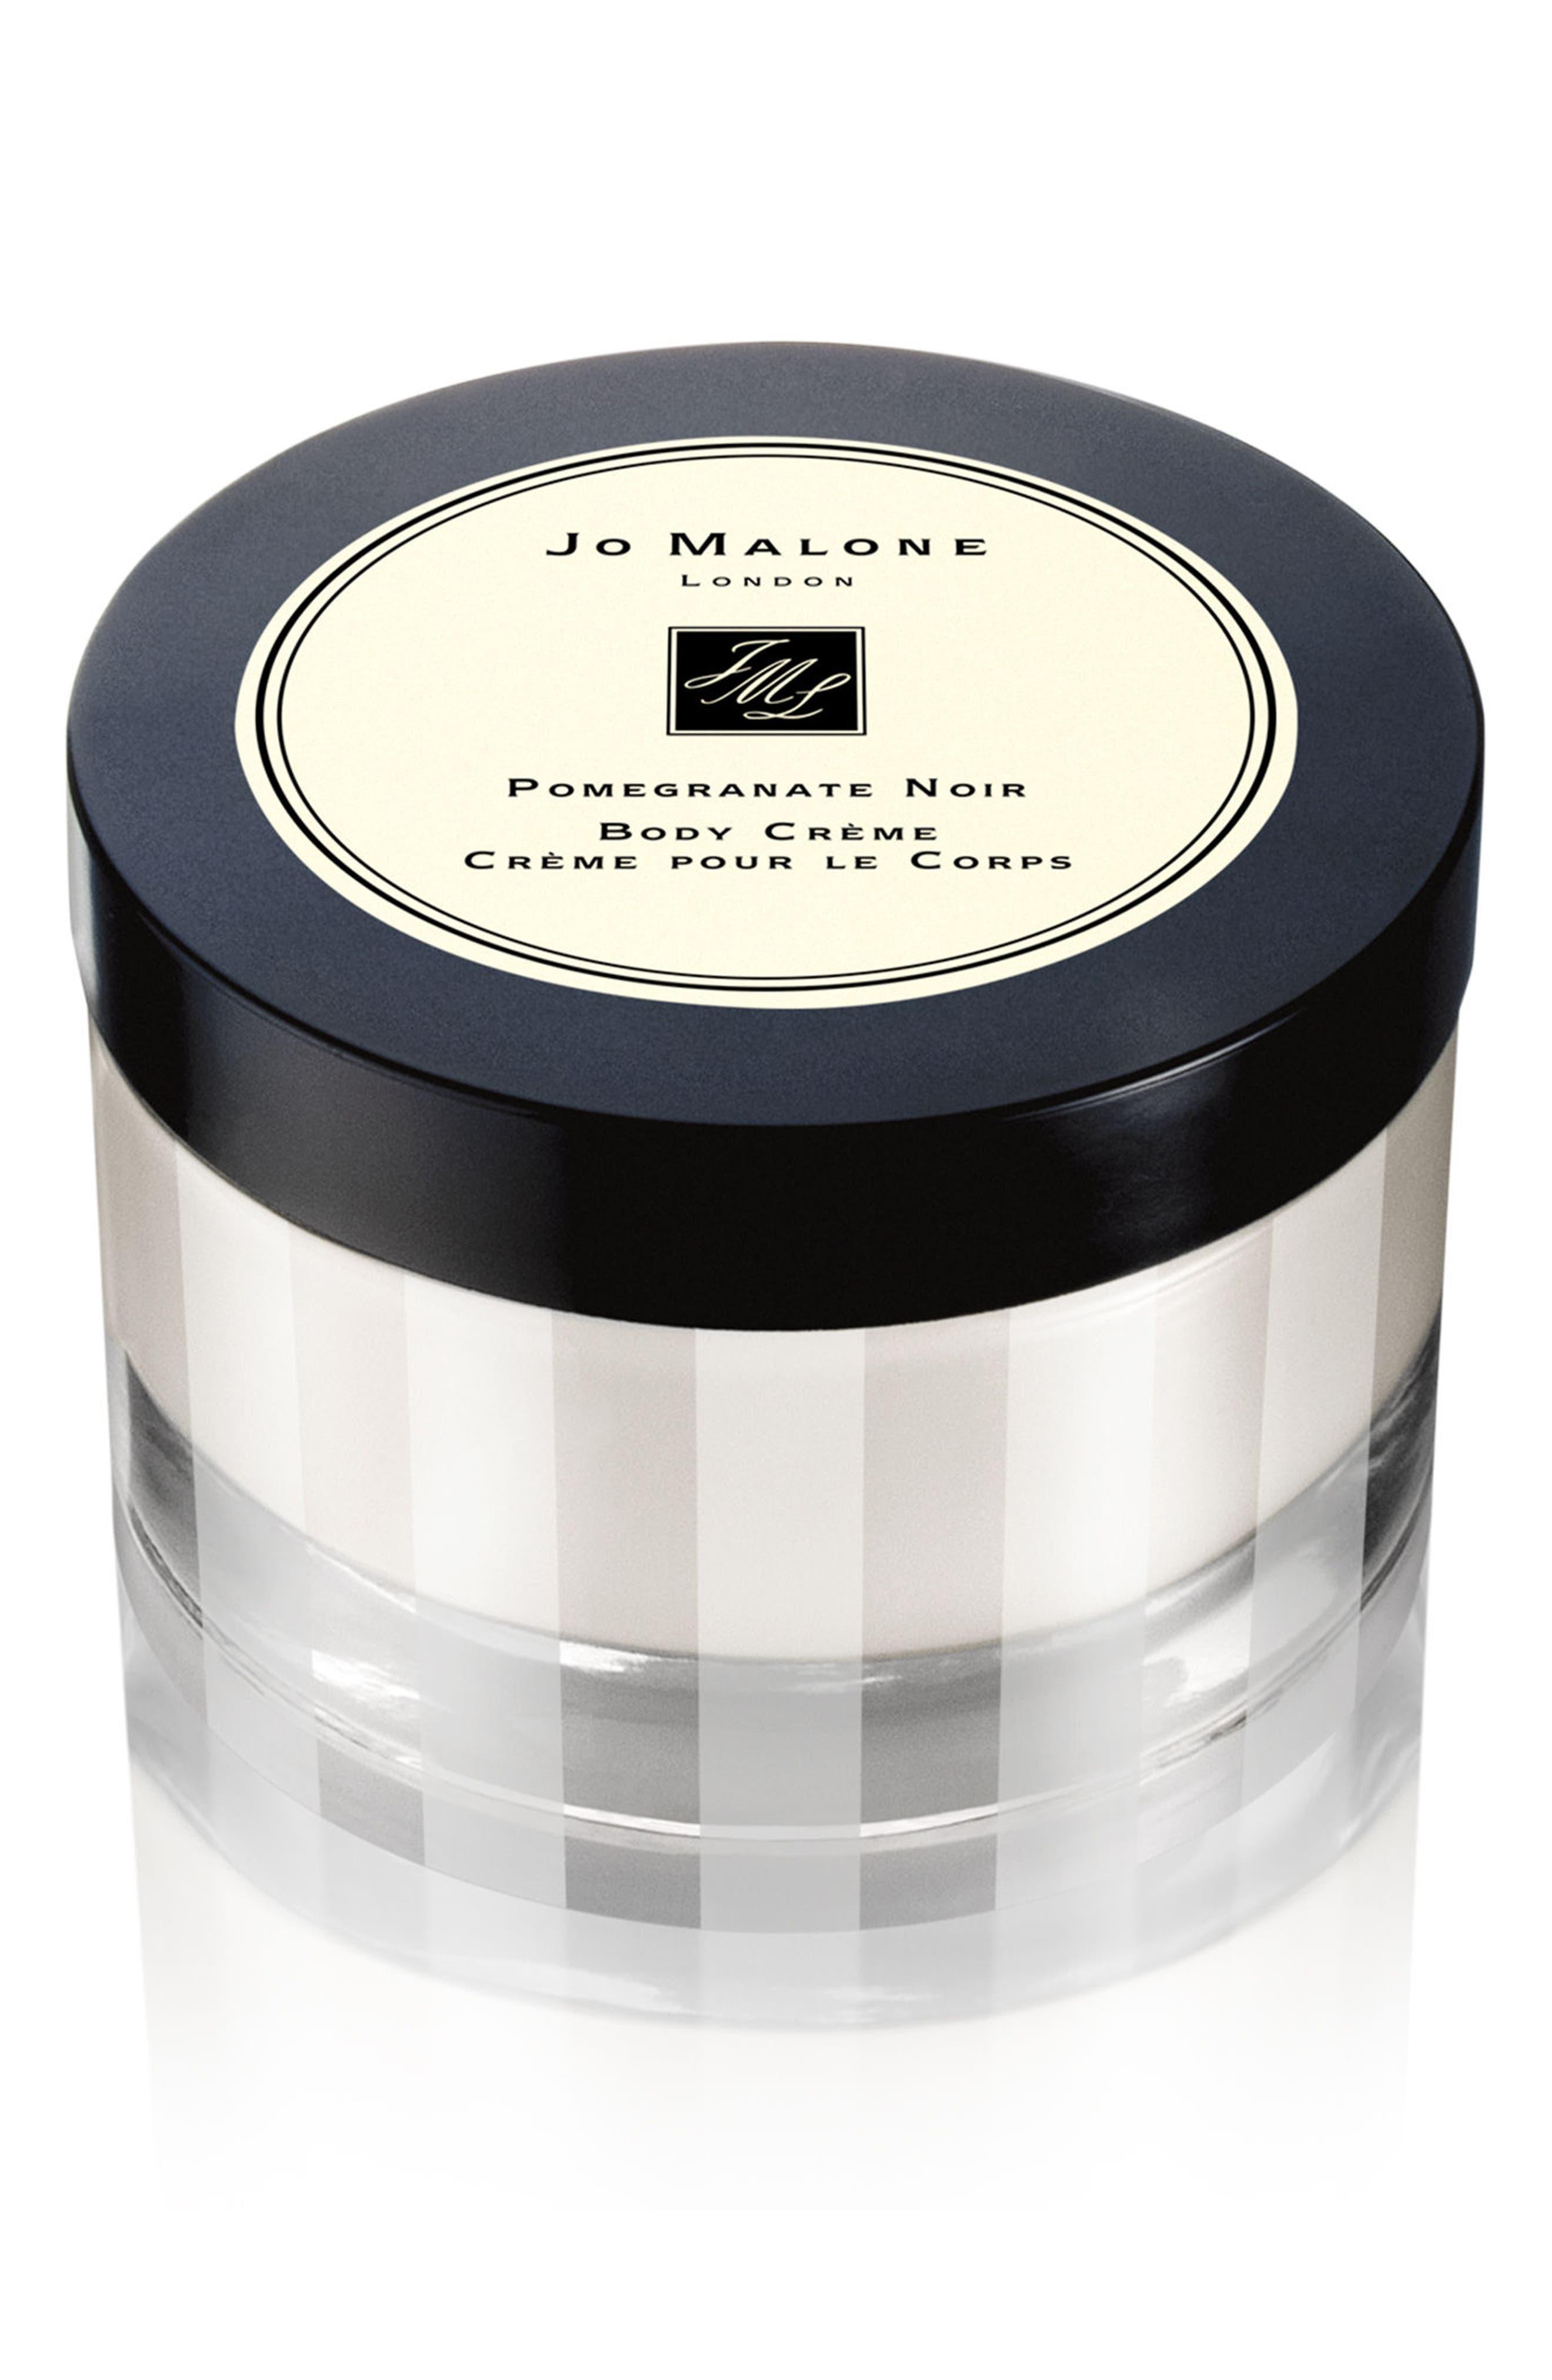 Alternate Image 1 Selected - Jo Malone London™ Pomegranate Noir Body Crème